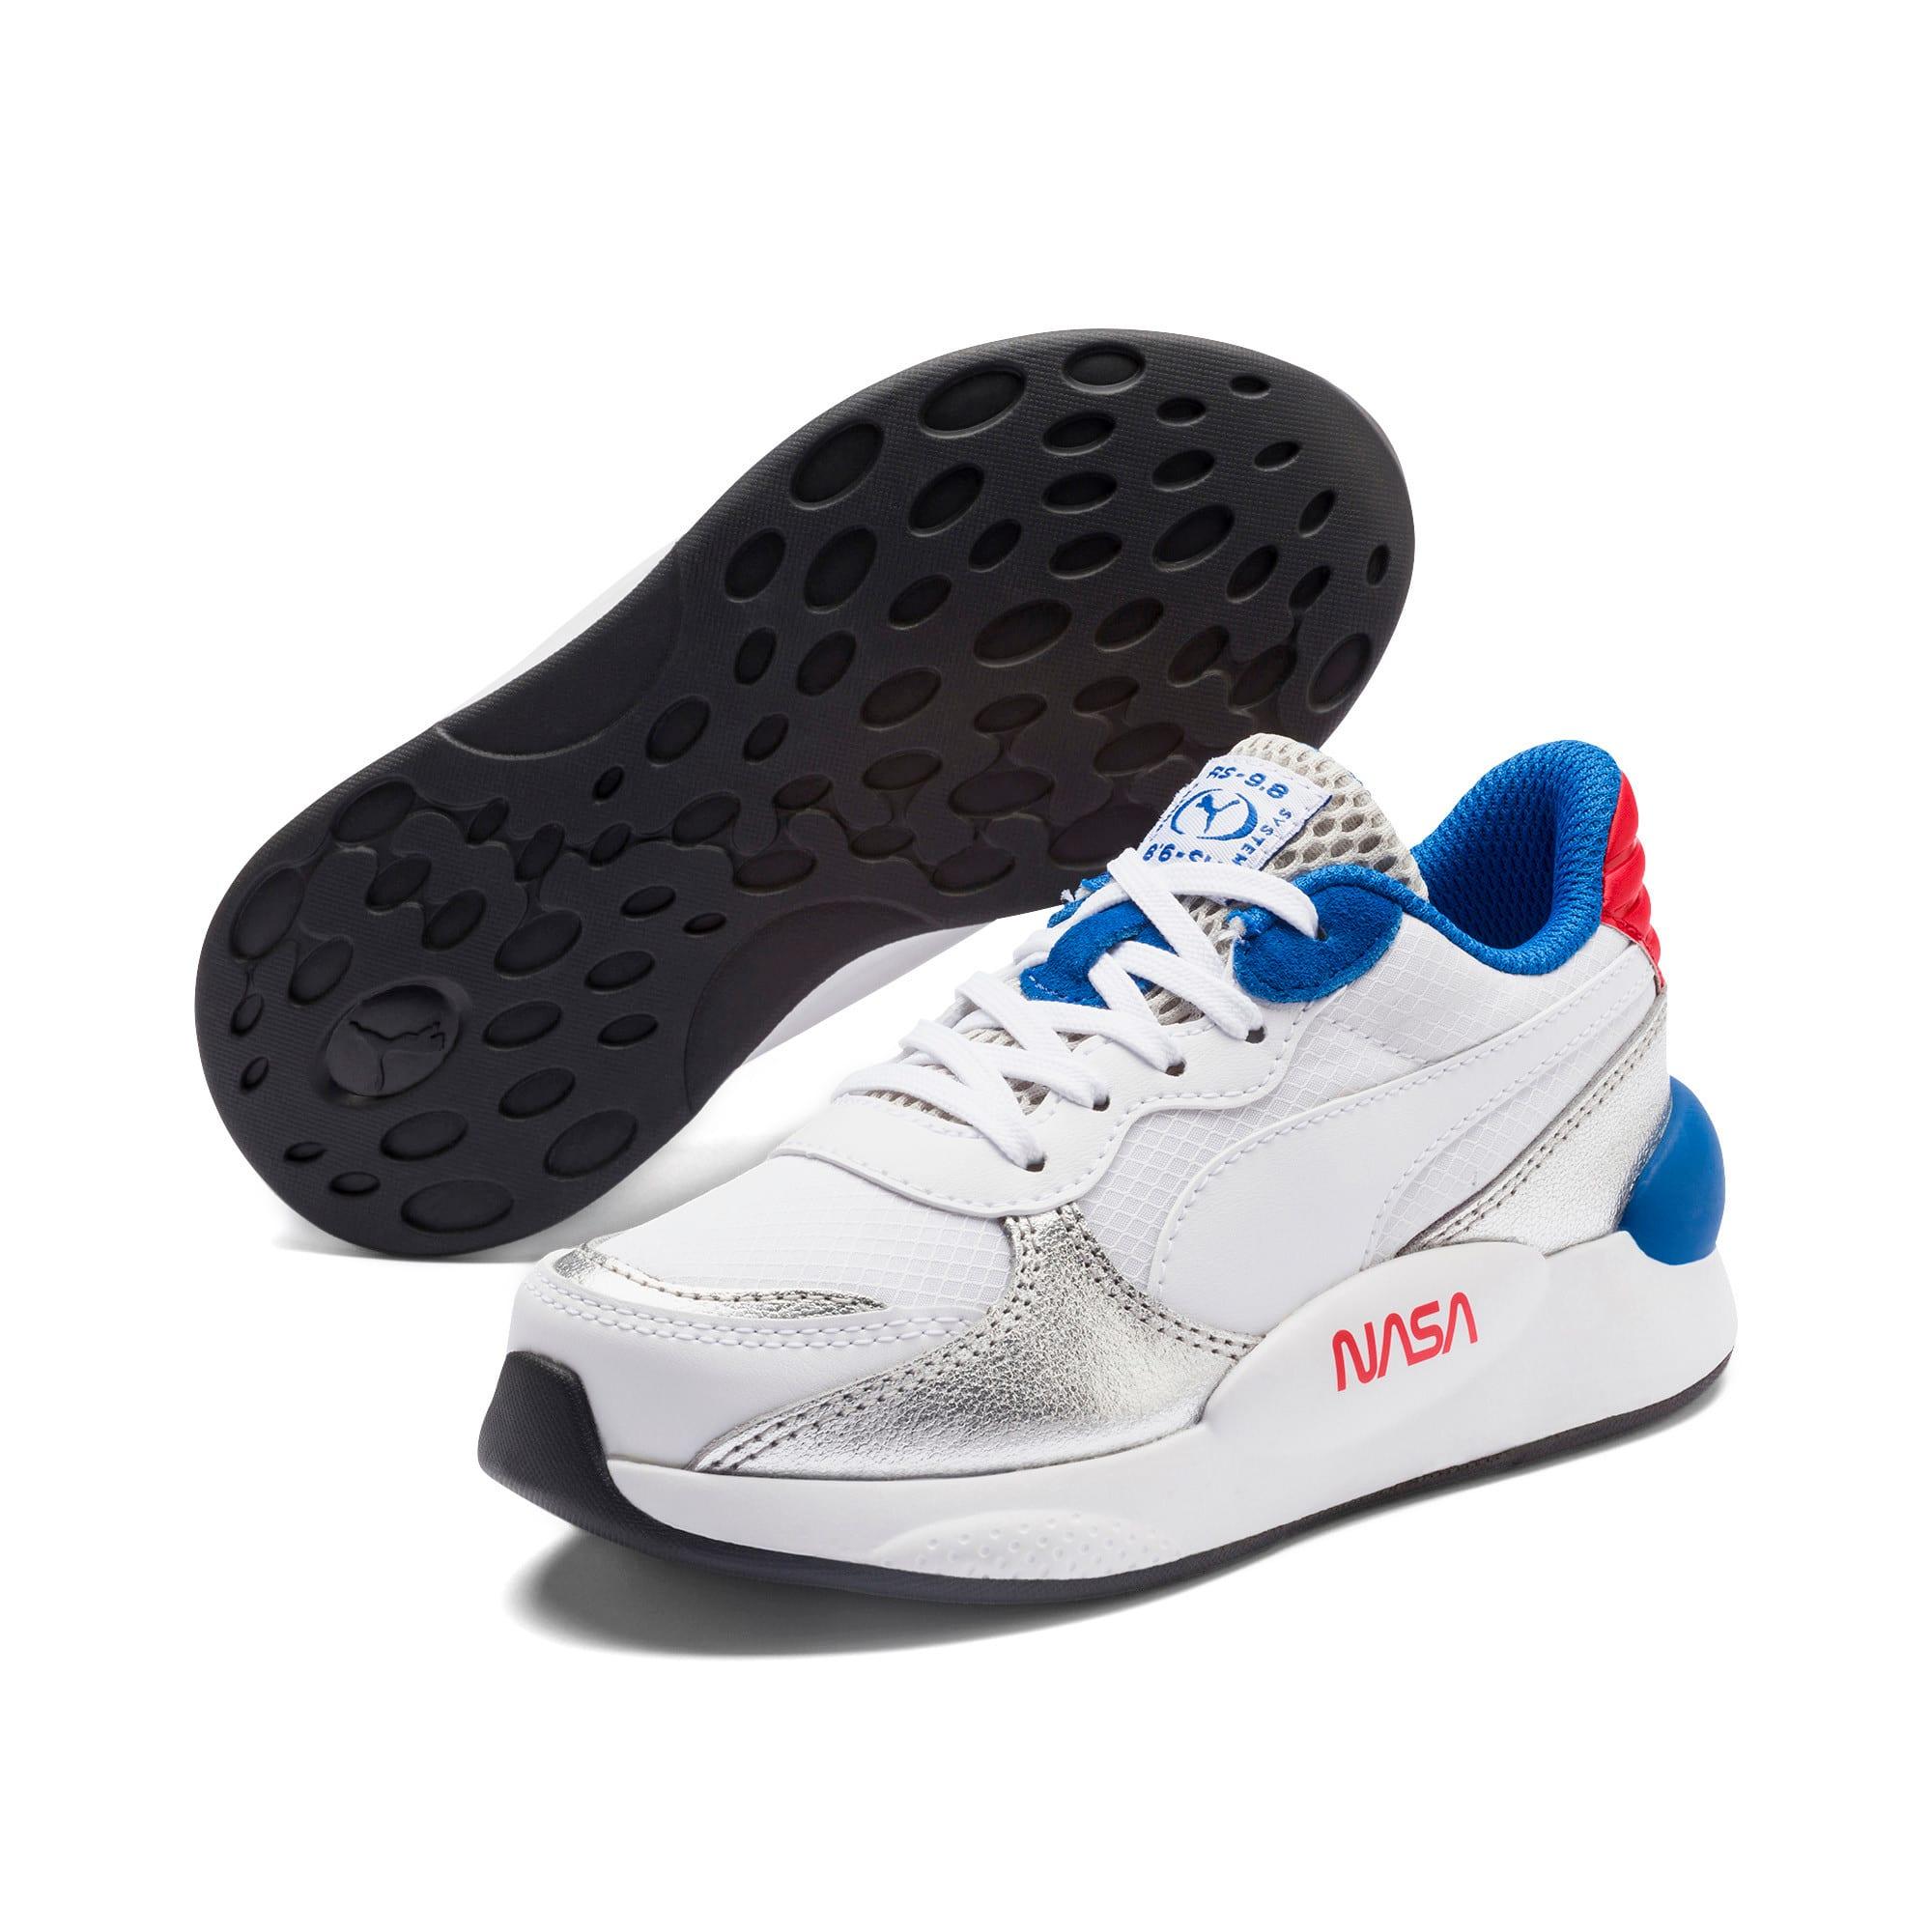 Thumbnail 2 of RS 9.8 Space Agency Little Kids' Shoes, Puma White-Puma Silver, medium